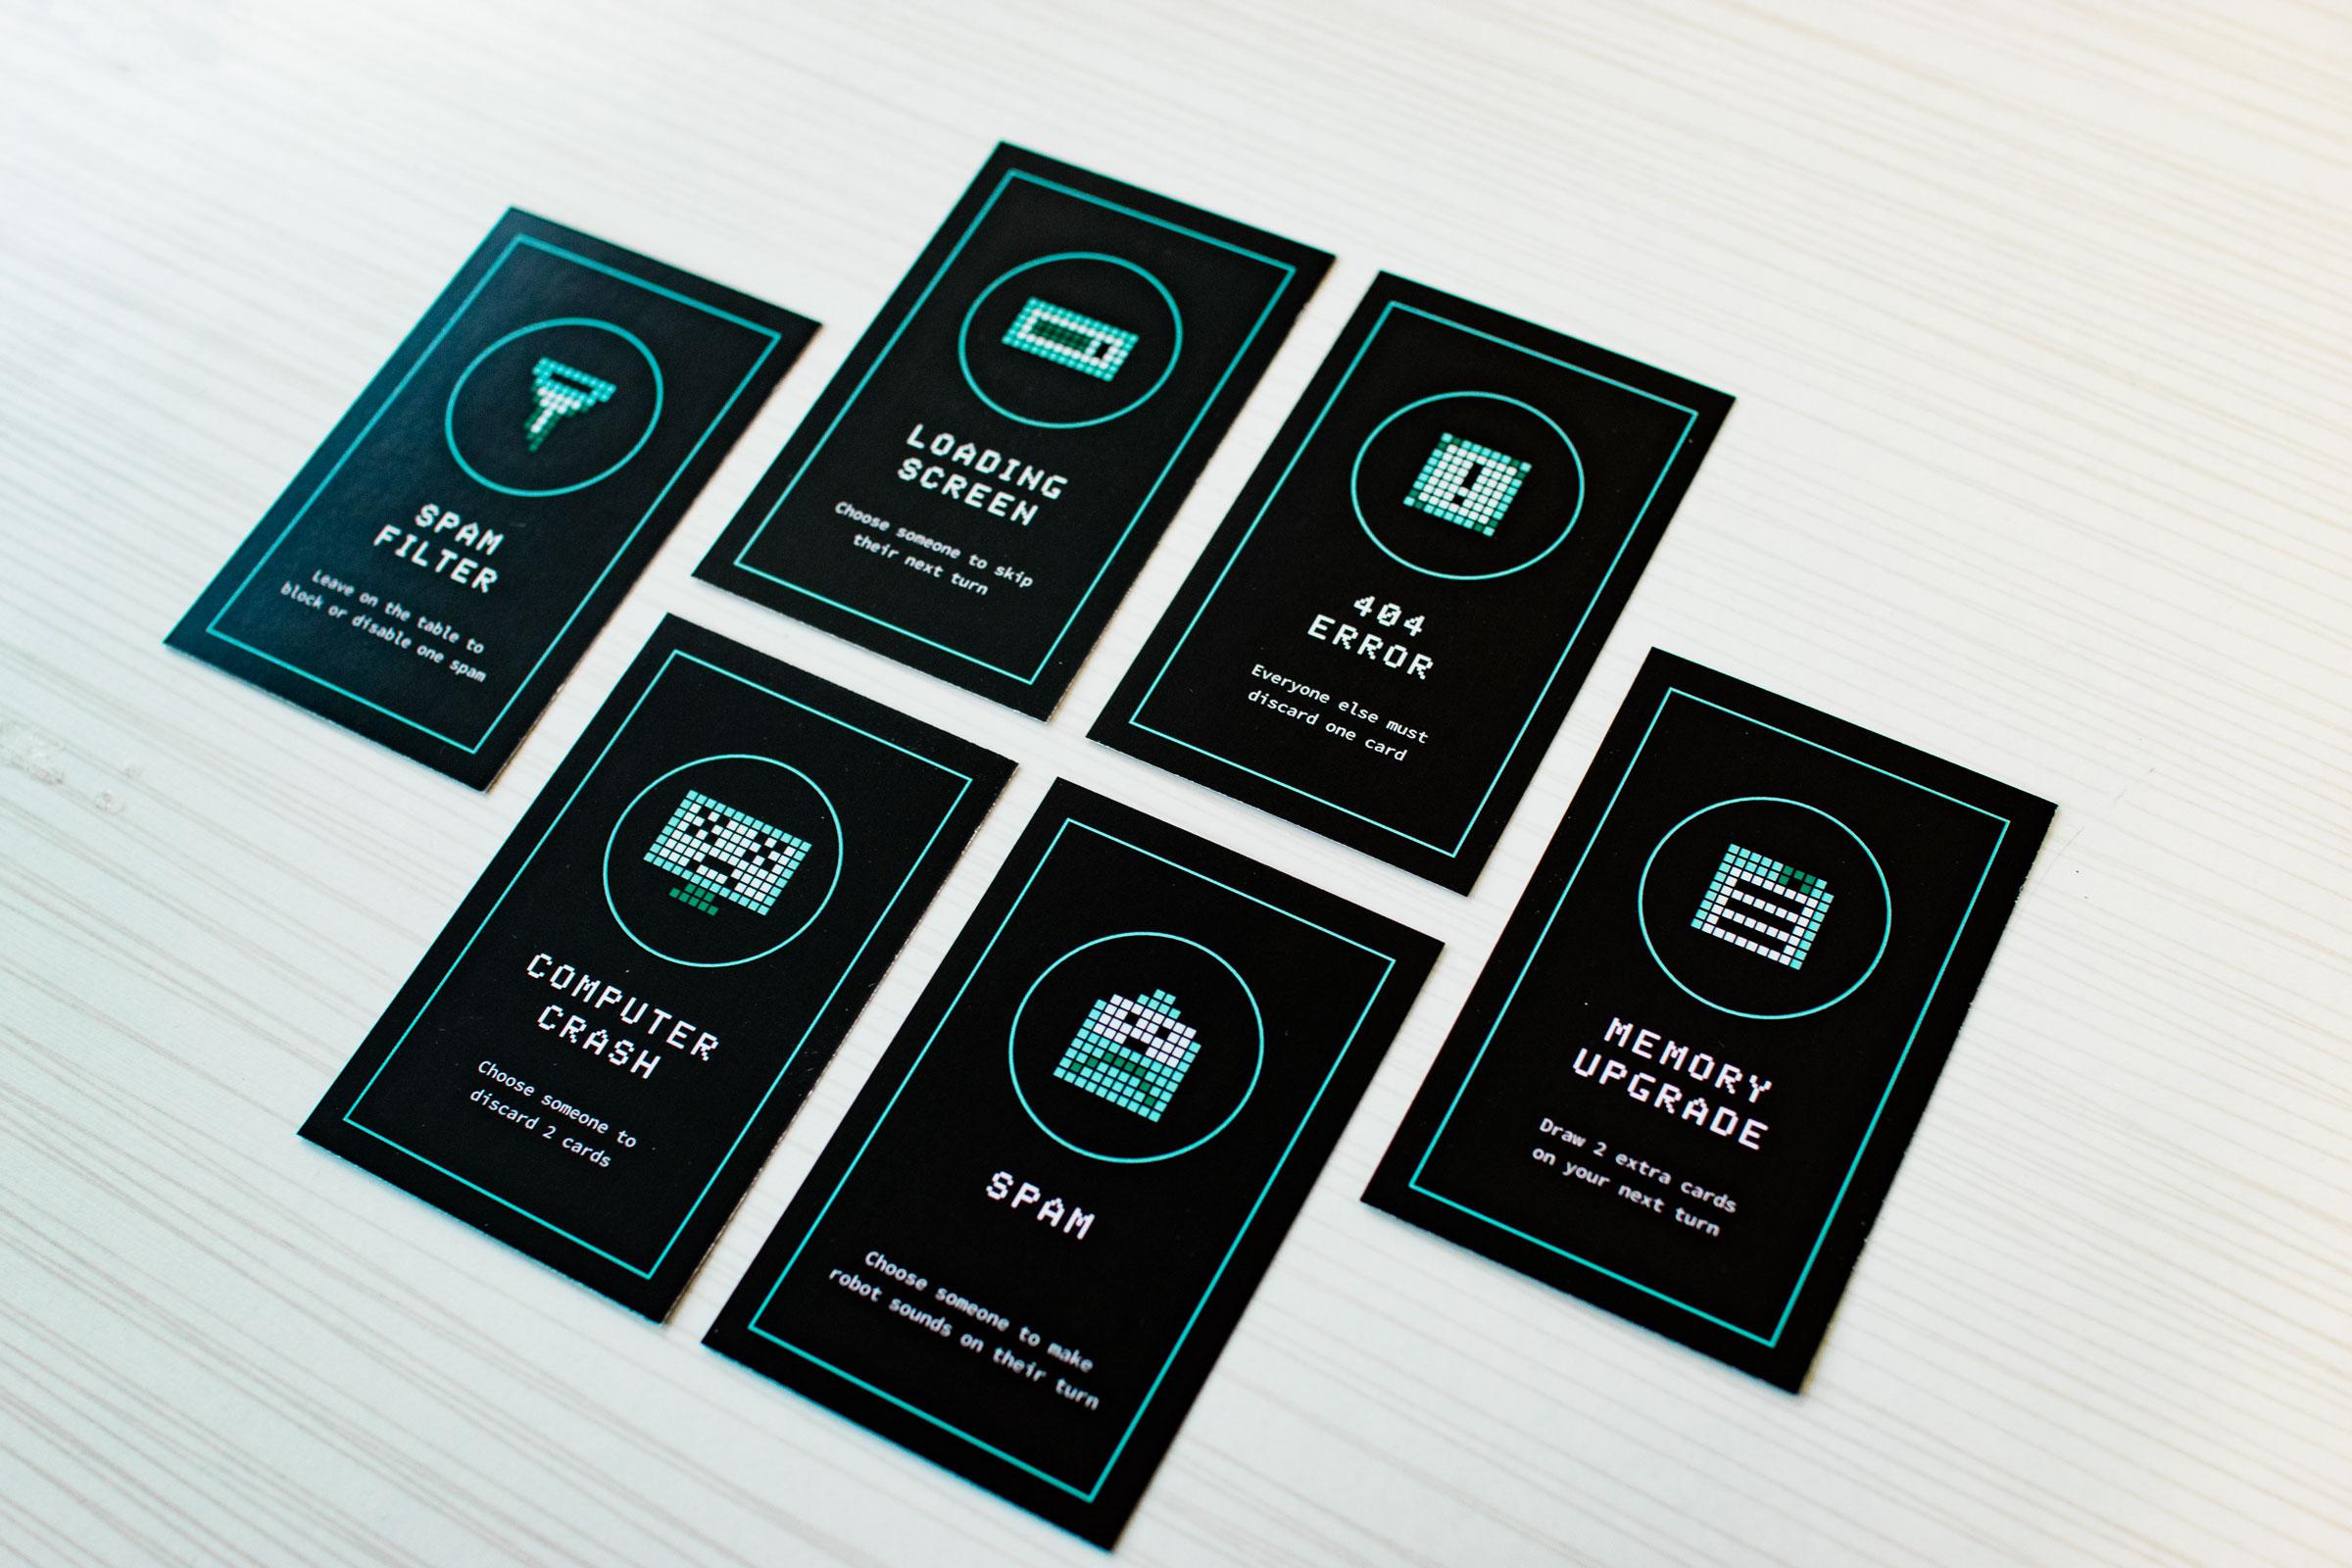 greencards.jpg